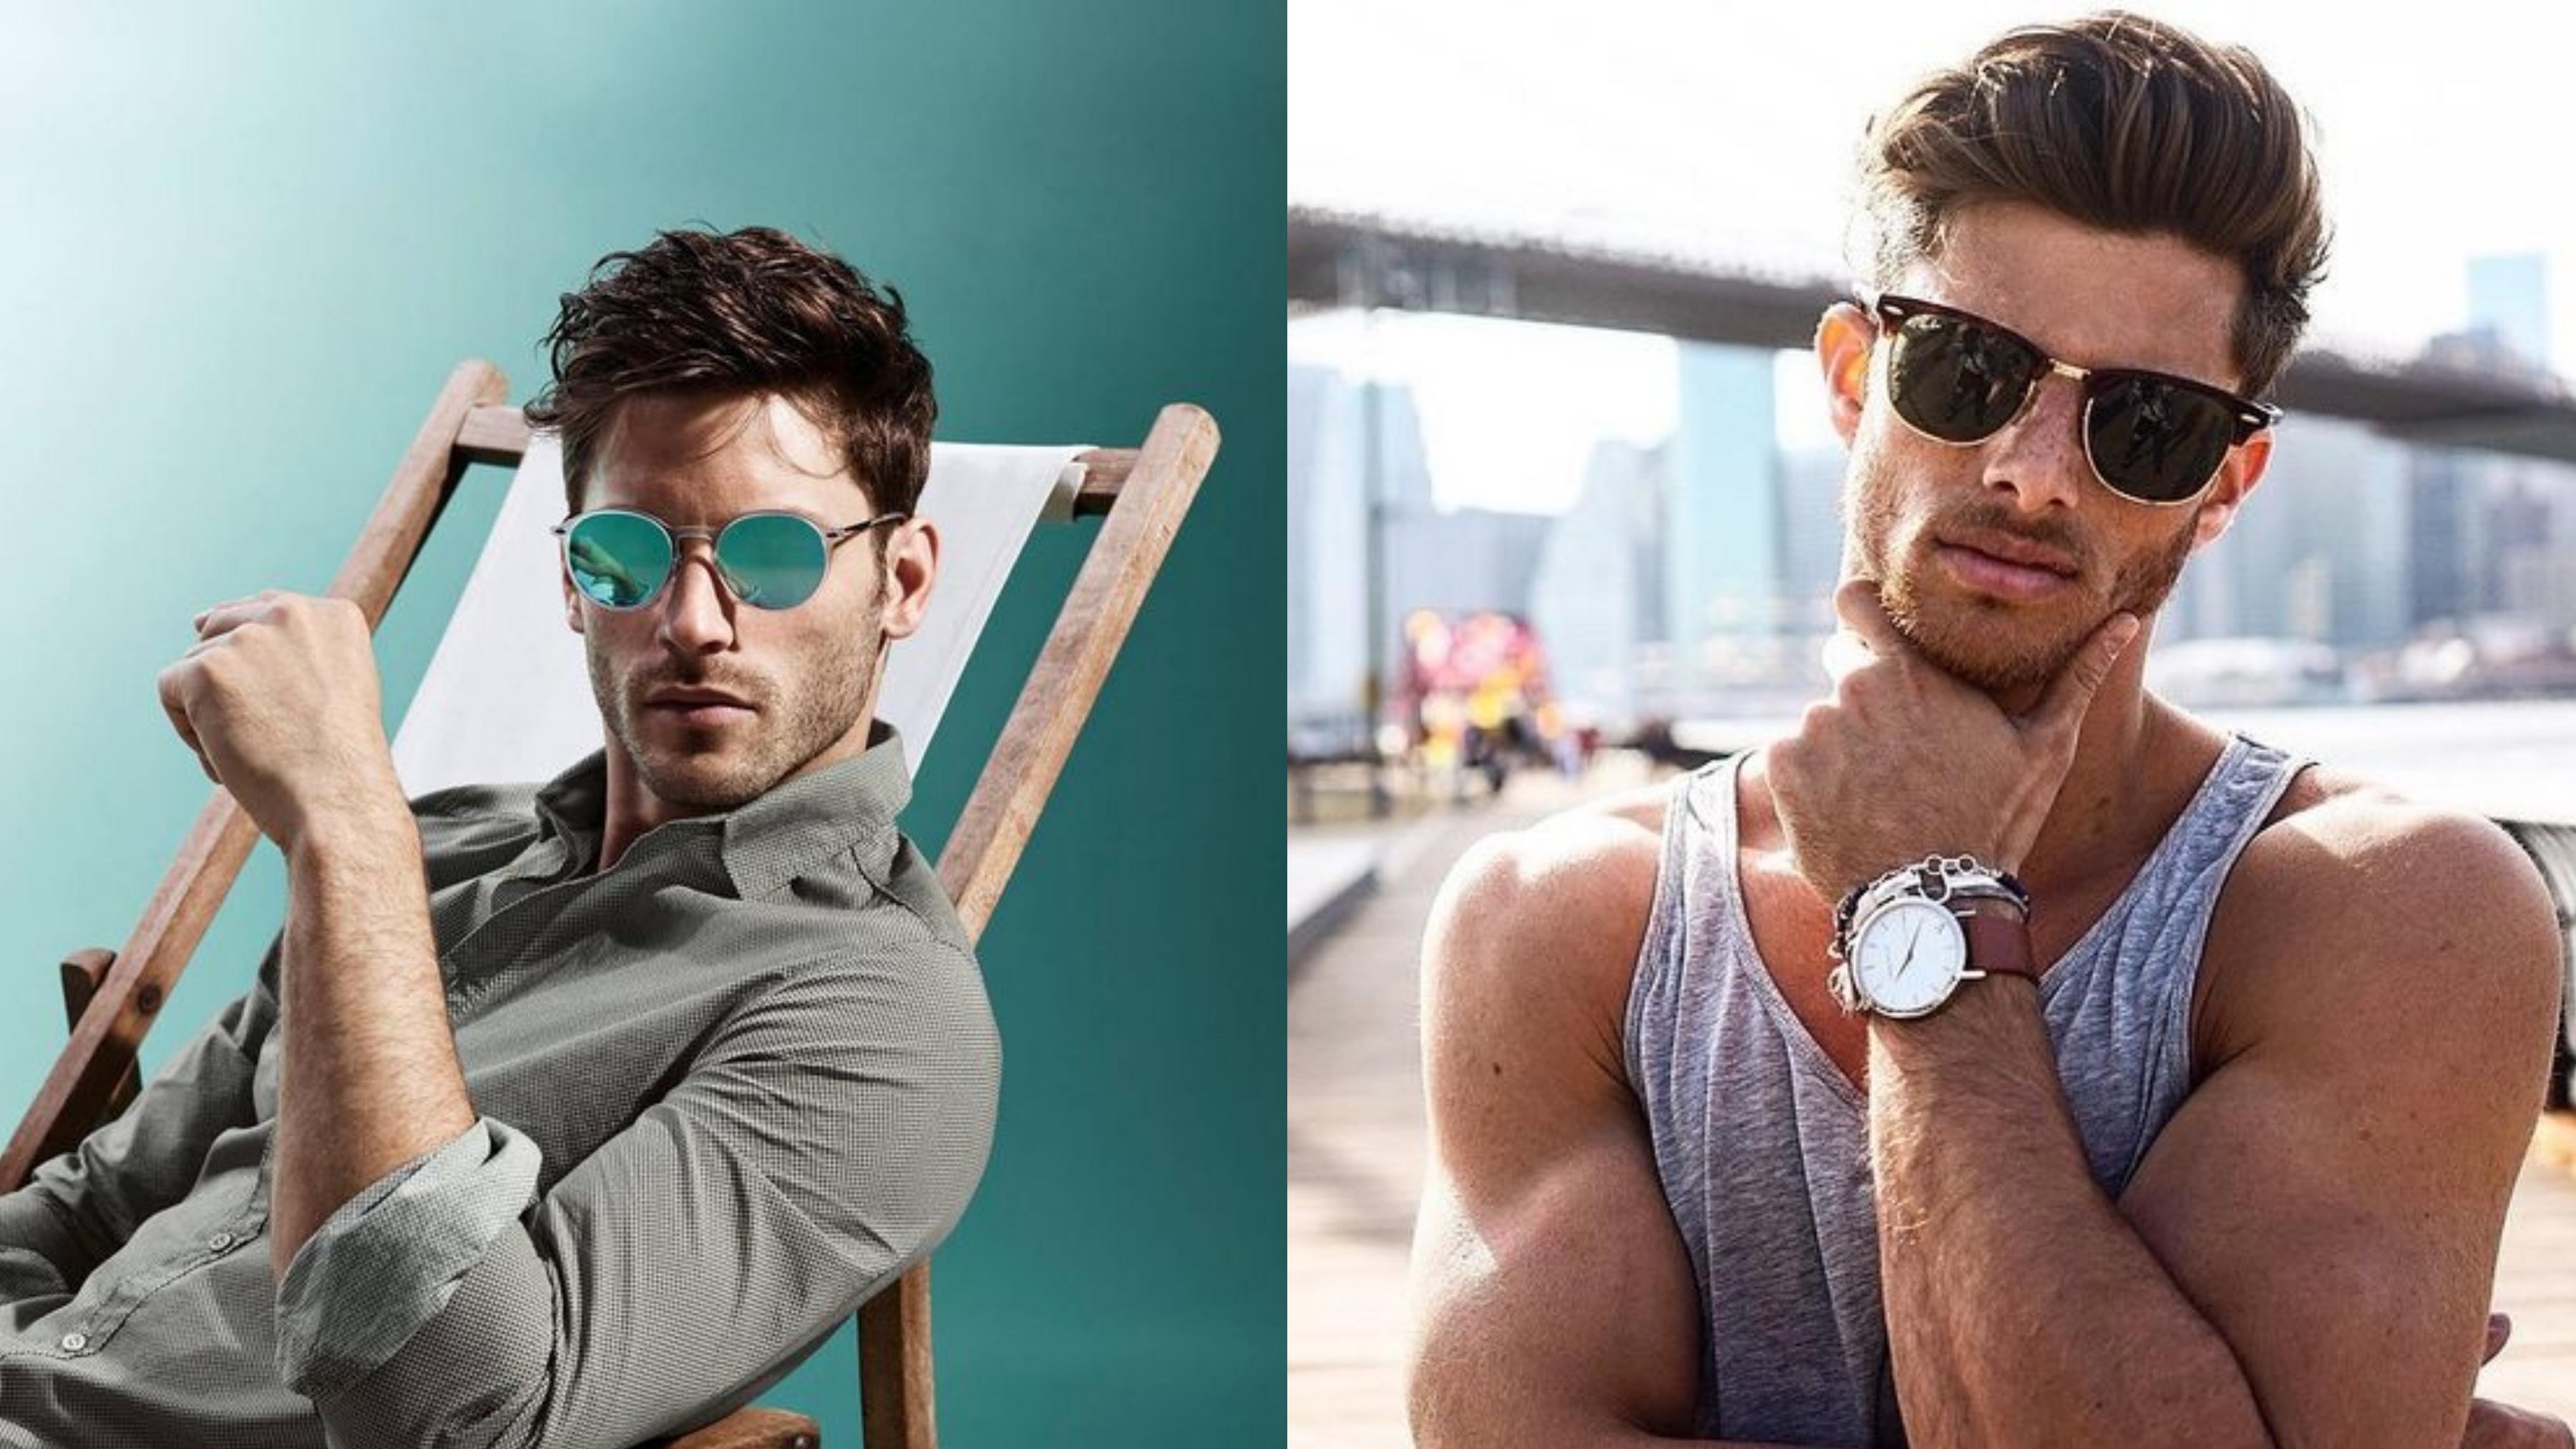 Select sunglasses